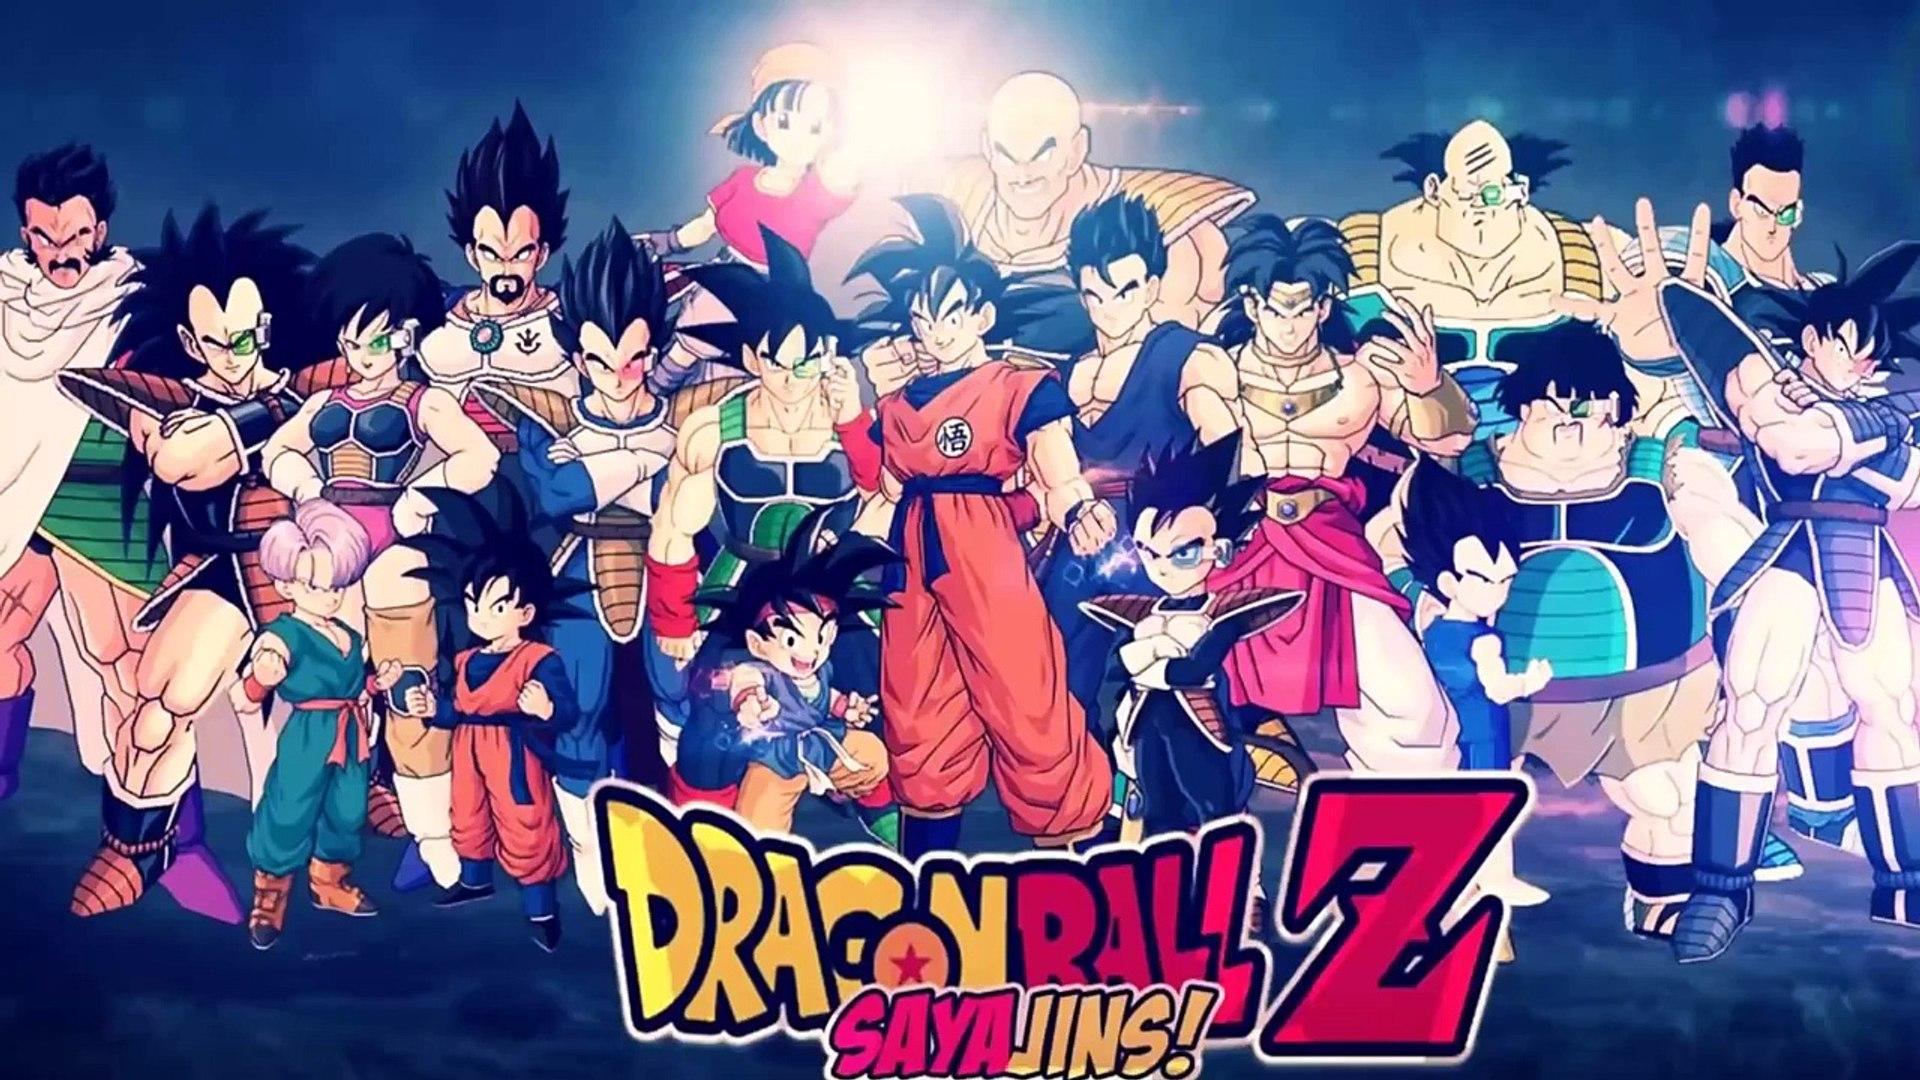 Dragon Ball Dbz The Forms Of Super Saiyan 1 100 X